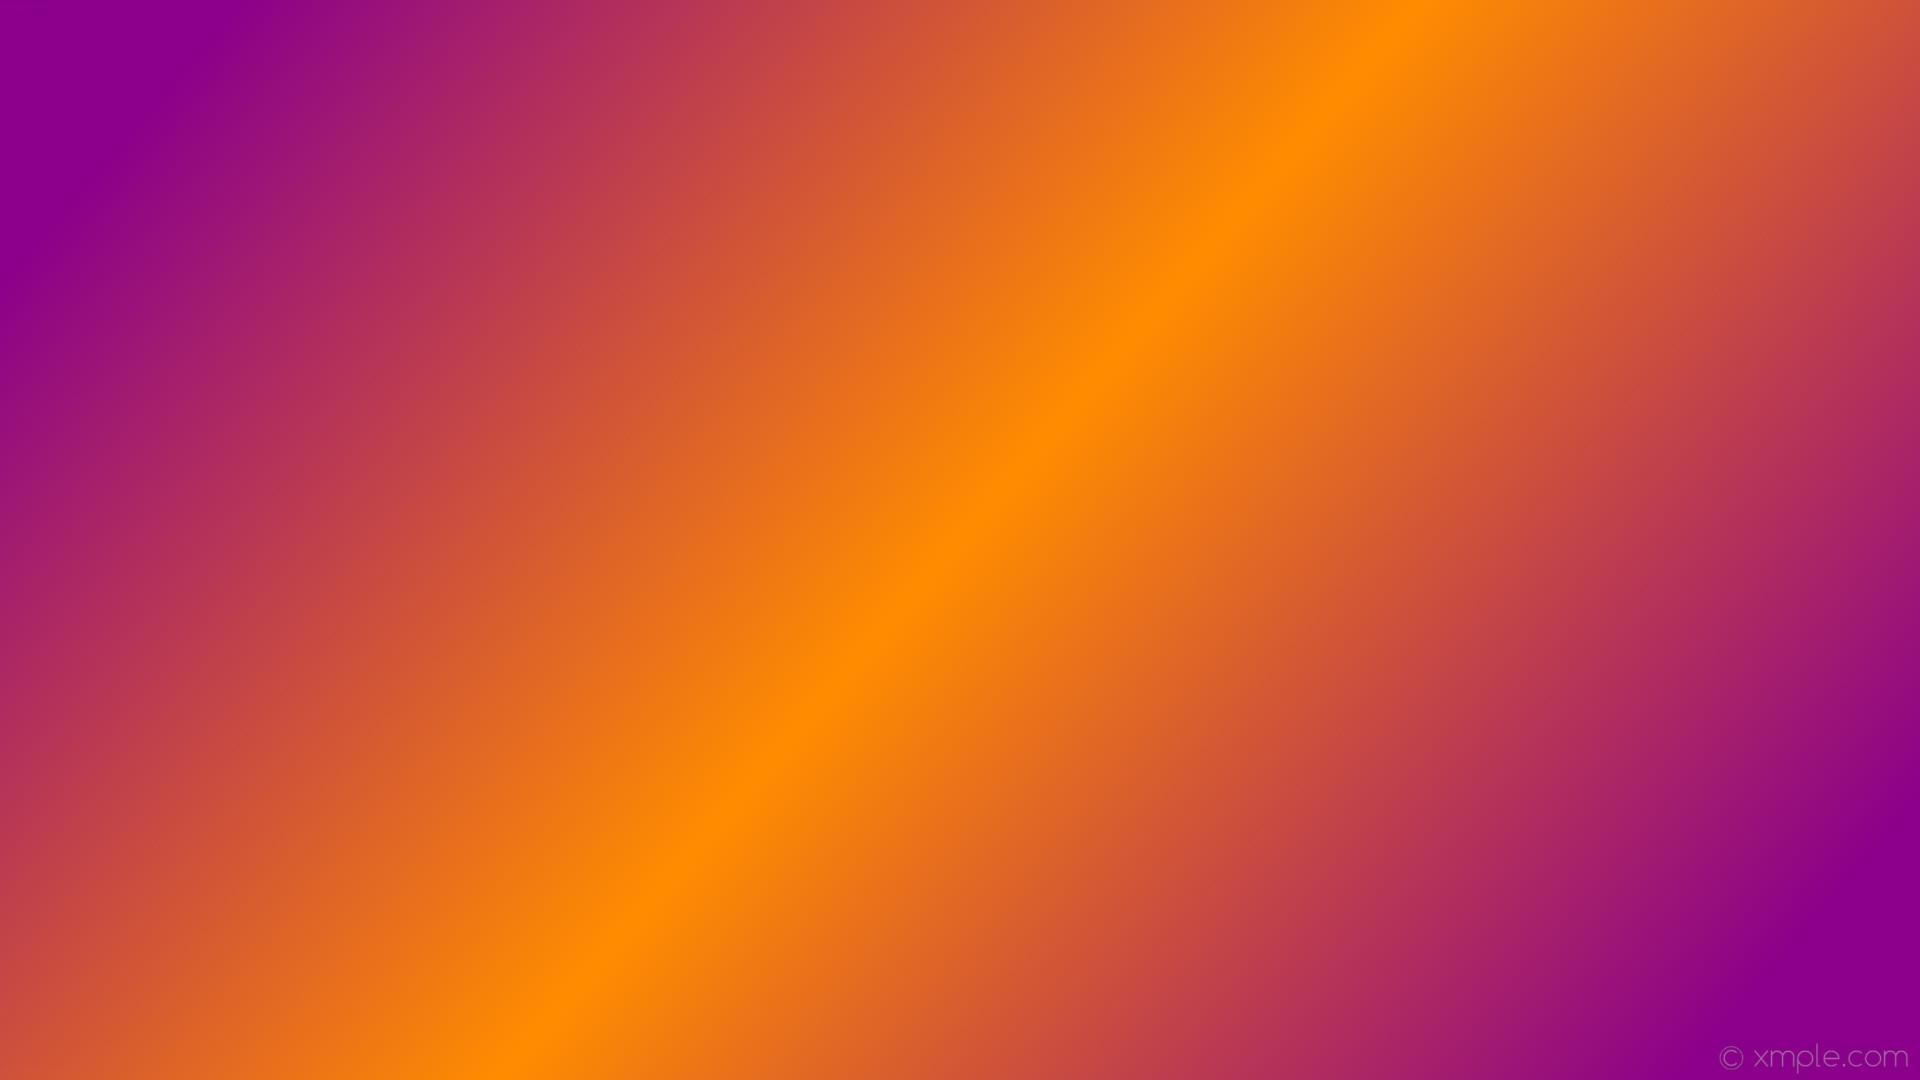 Purple and orange backgrounds 48 images - Dark orange wallpaper ...